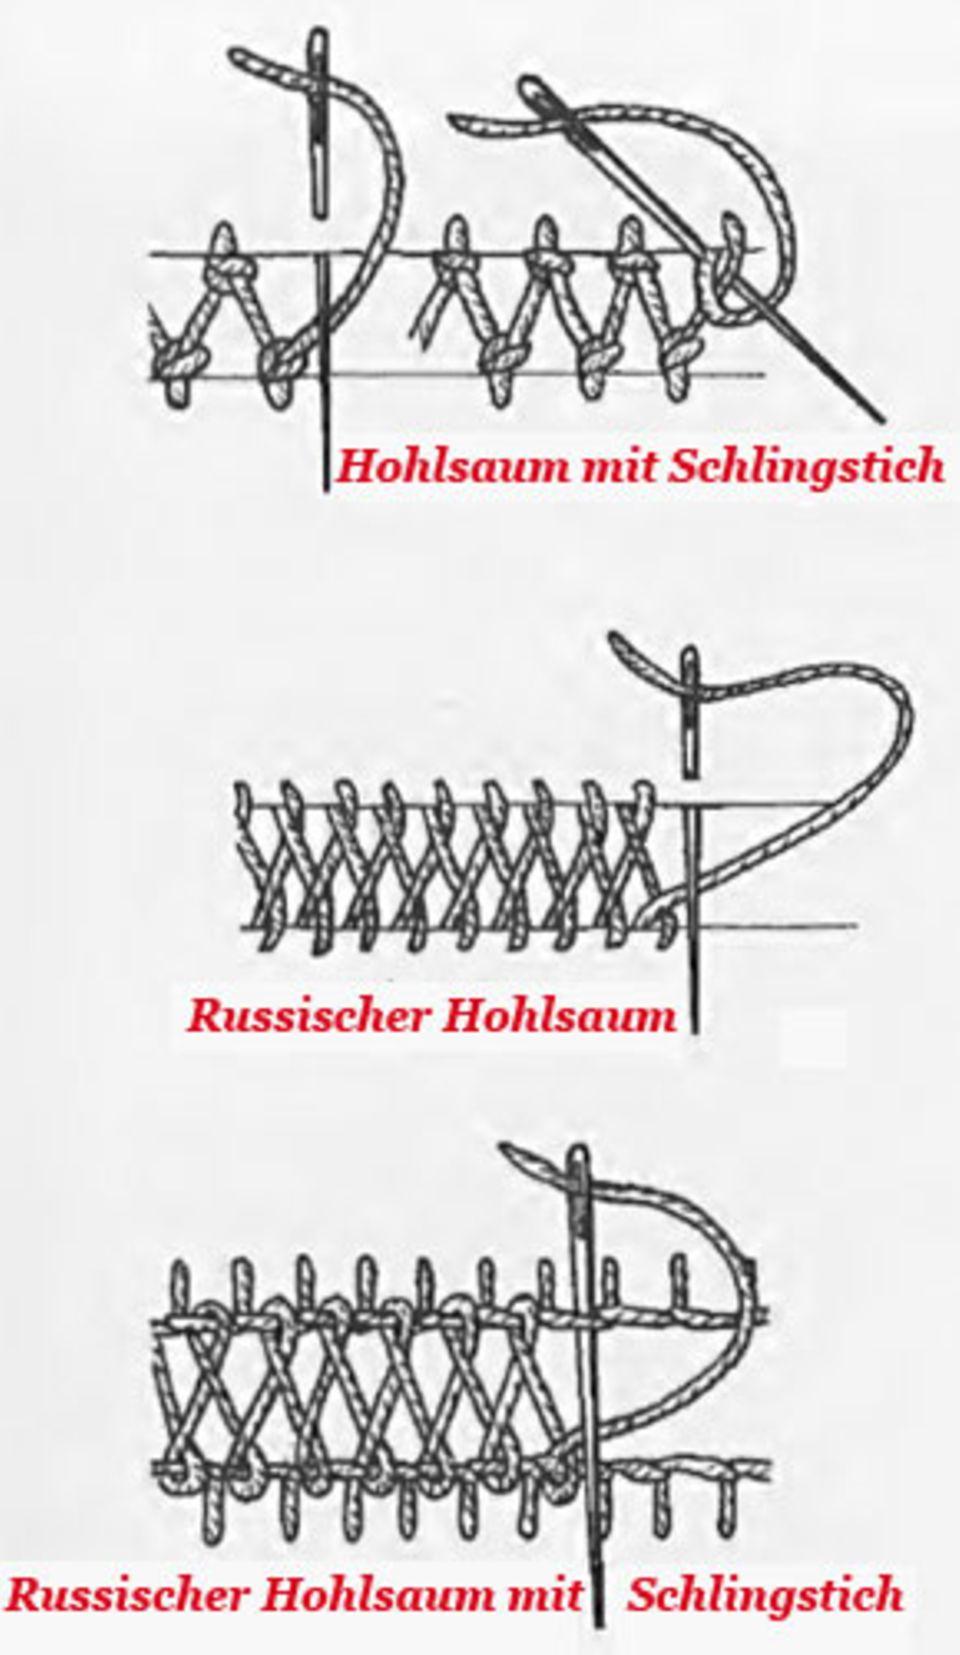 Der Hohlsaum